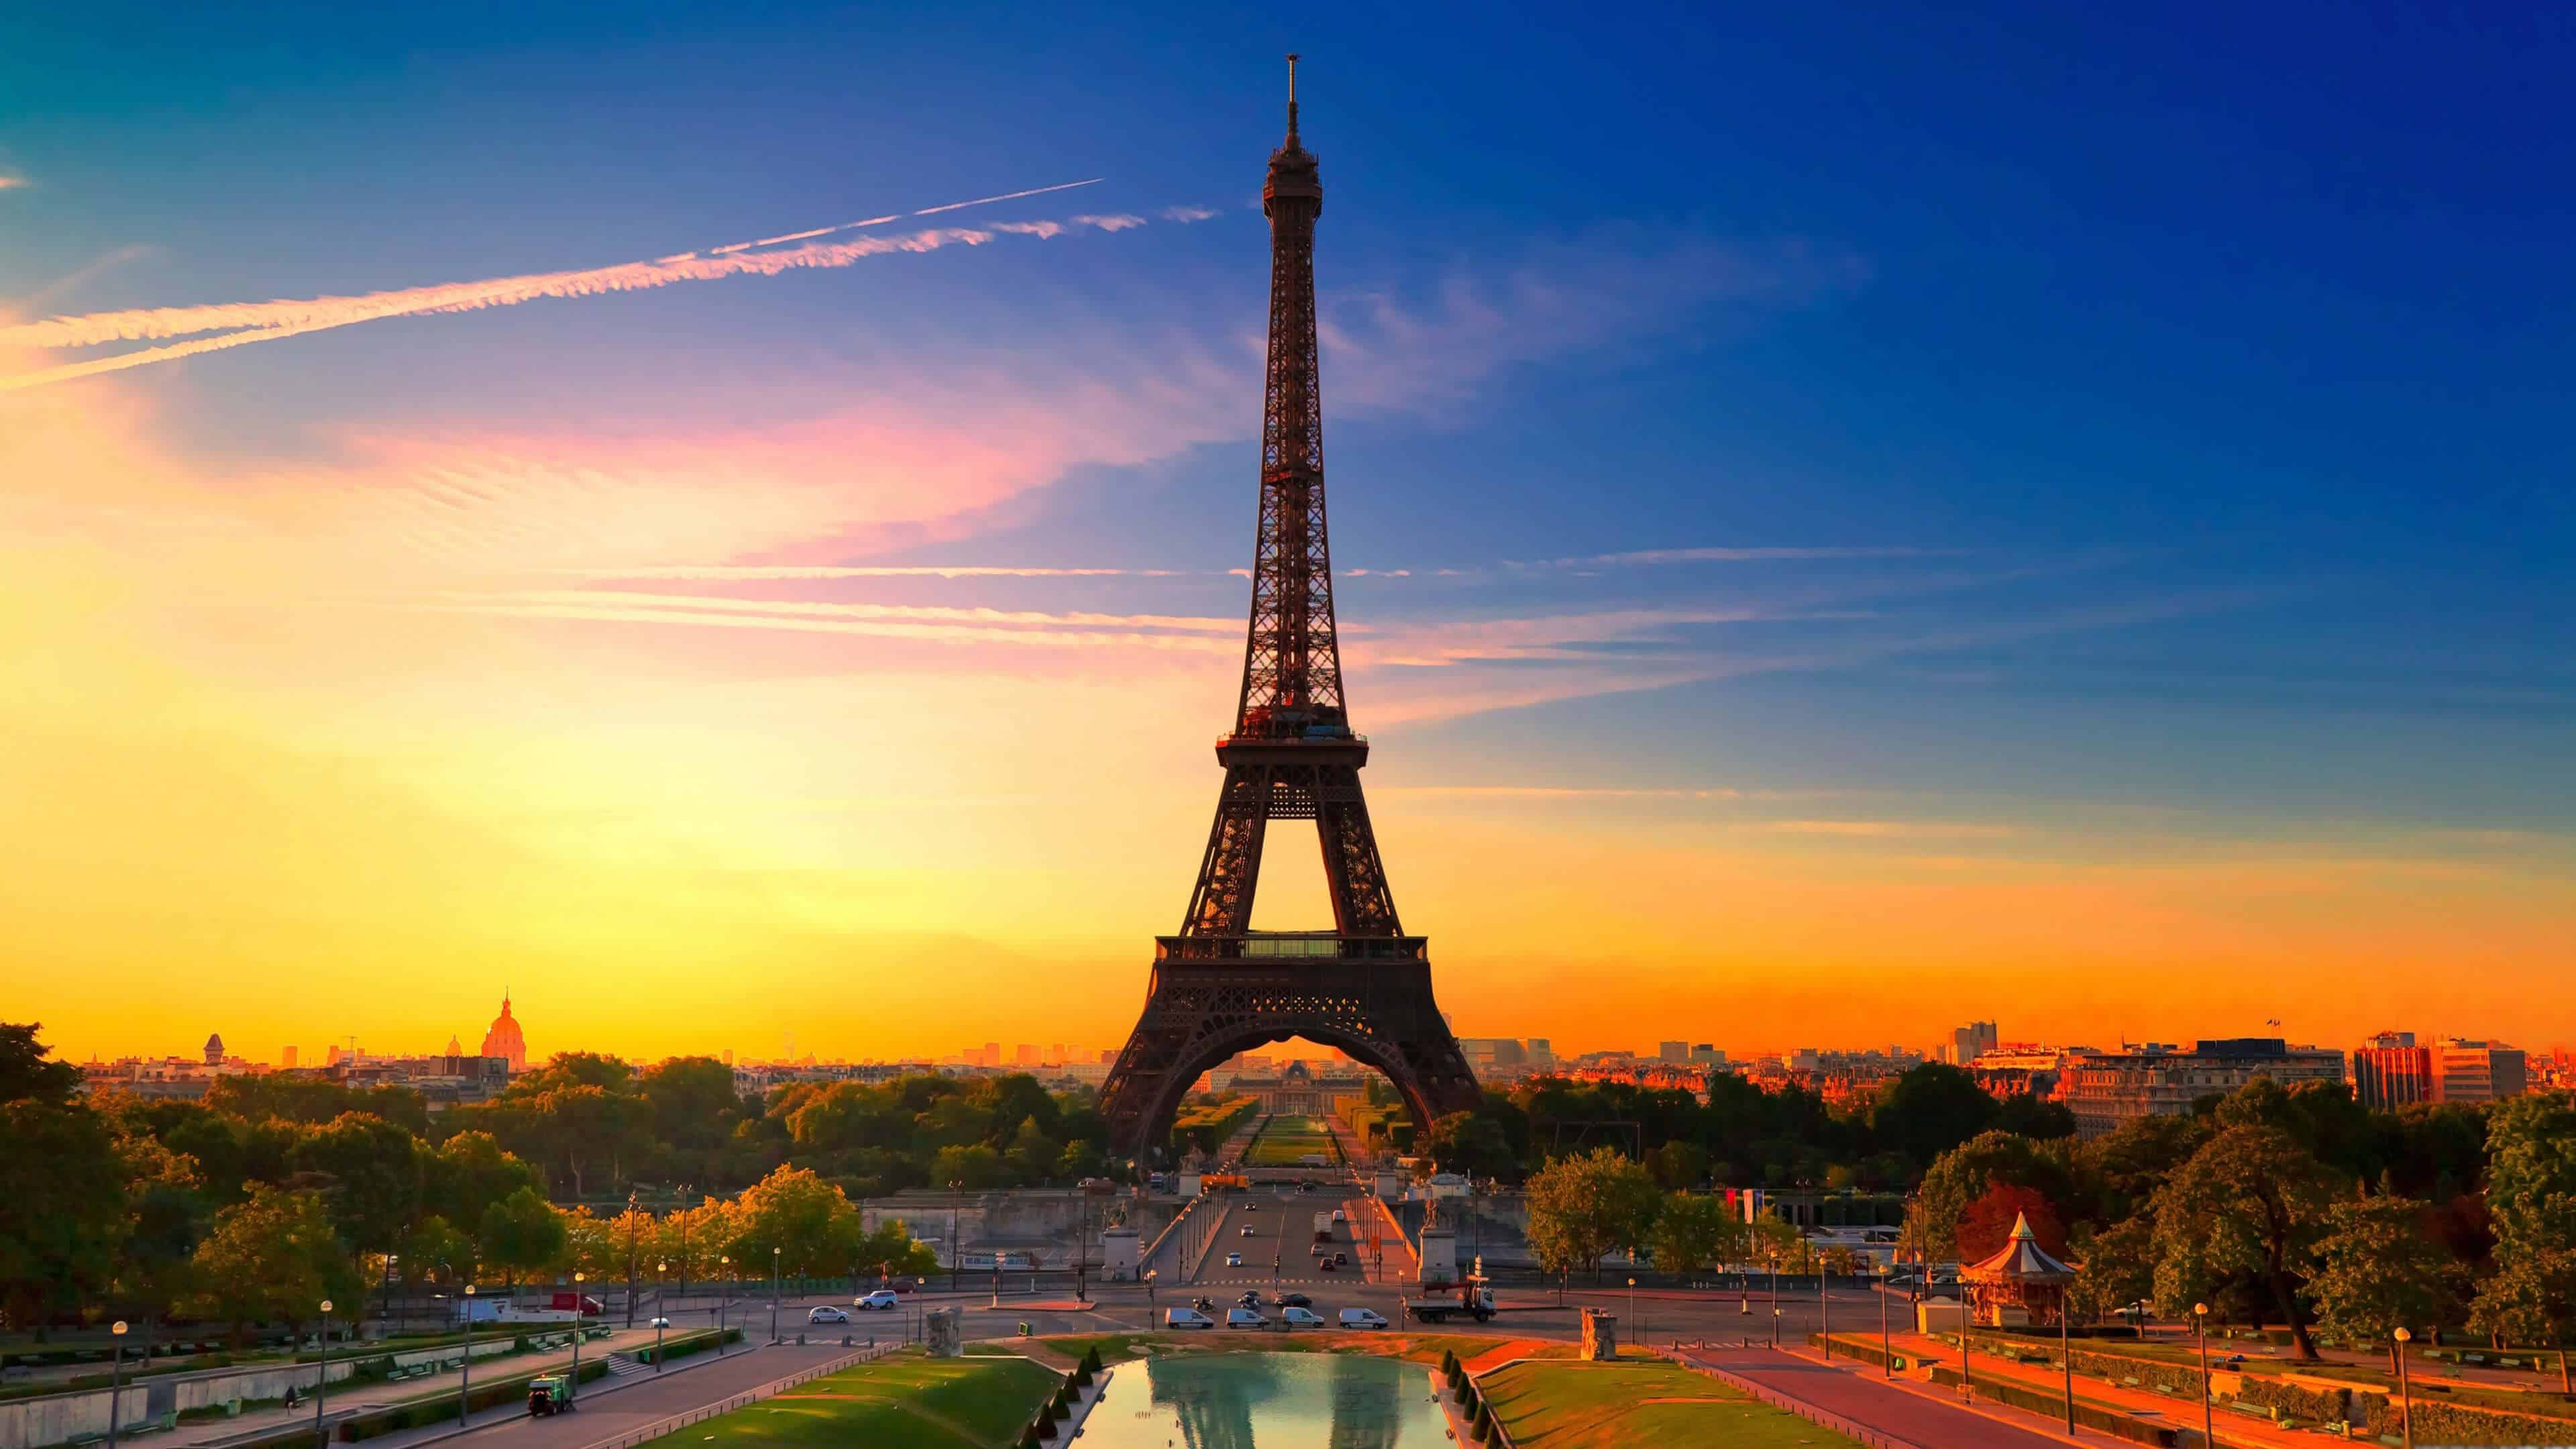 eiffel tower at sunset paris france uhd 4k wallpaper